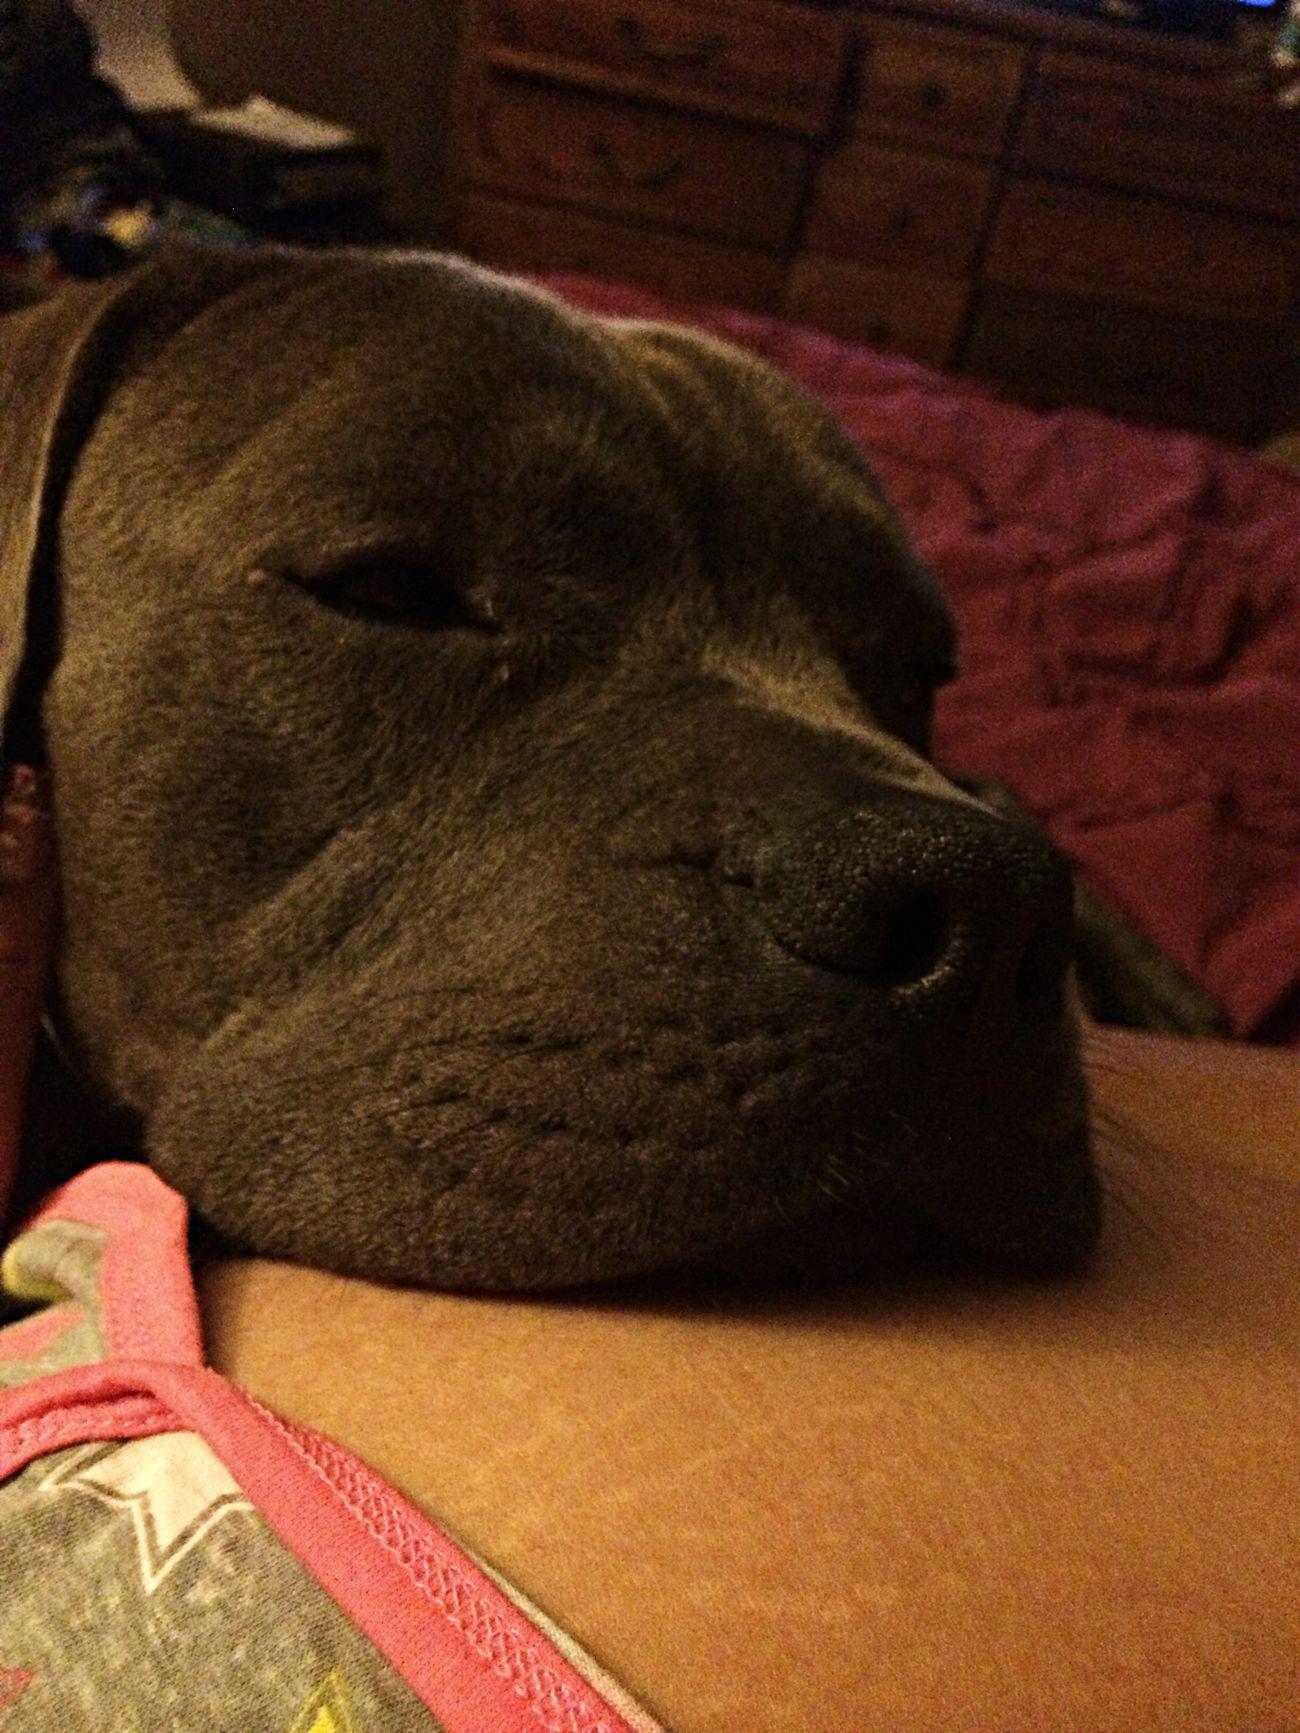 My doggy. I love him so much Jlove Bluenosebully Dontbullymybreed Pitbull♥